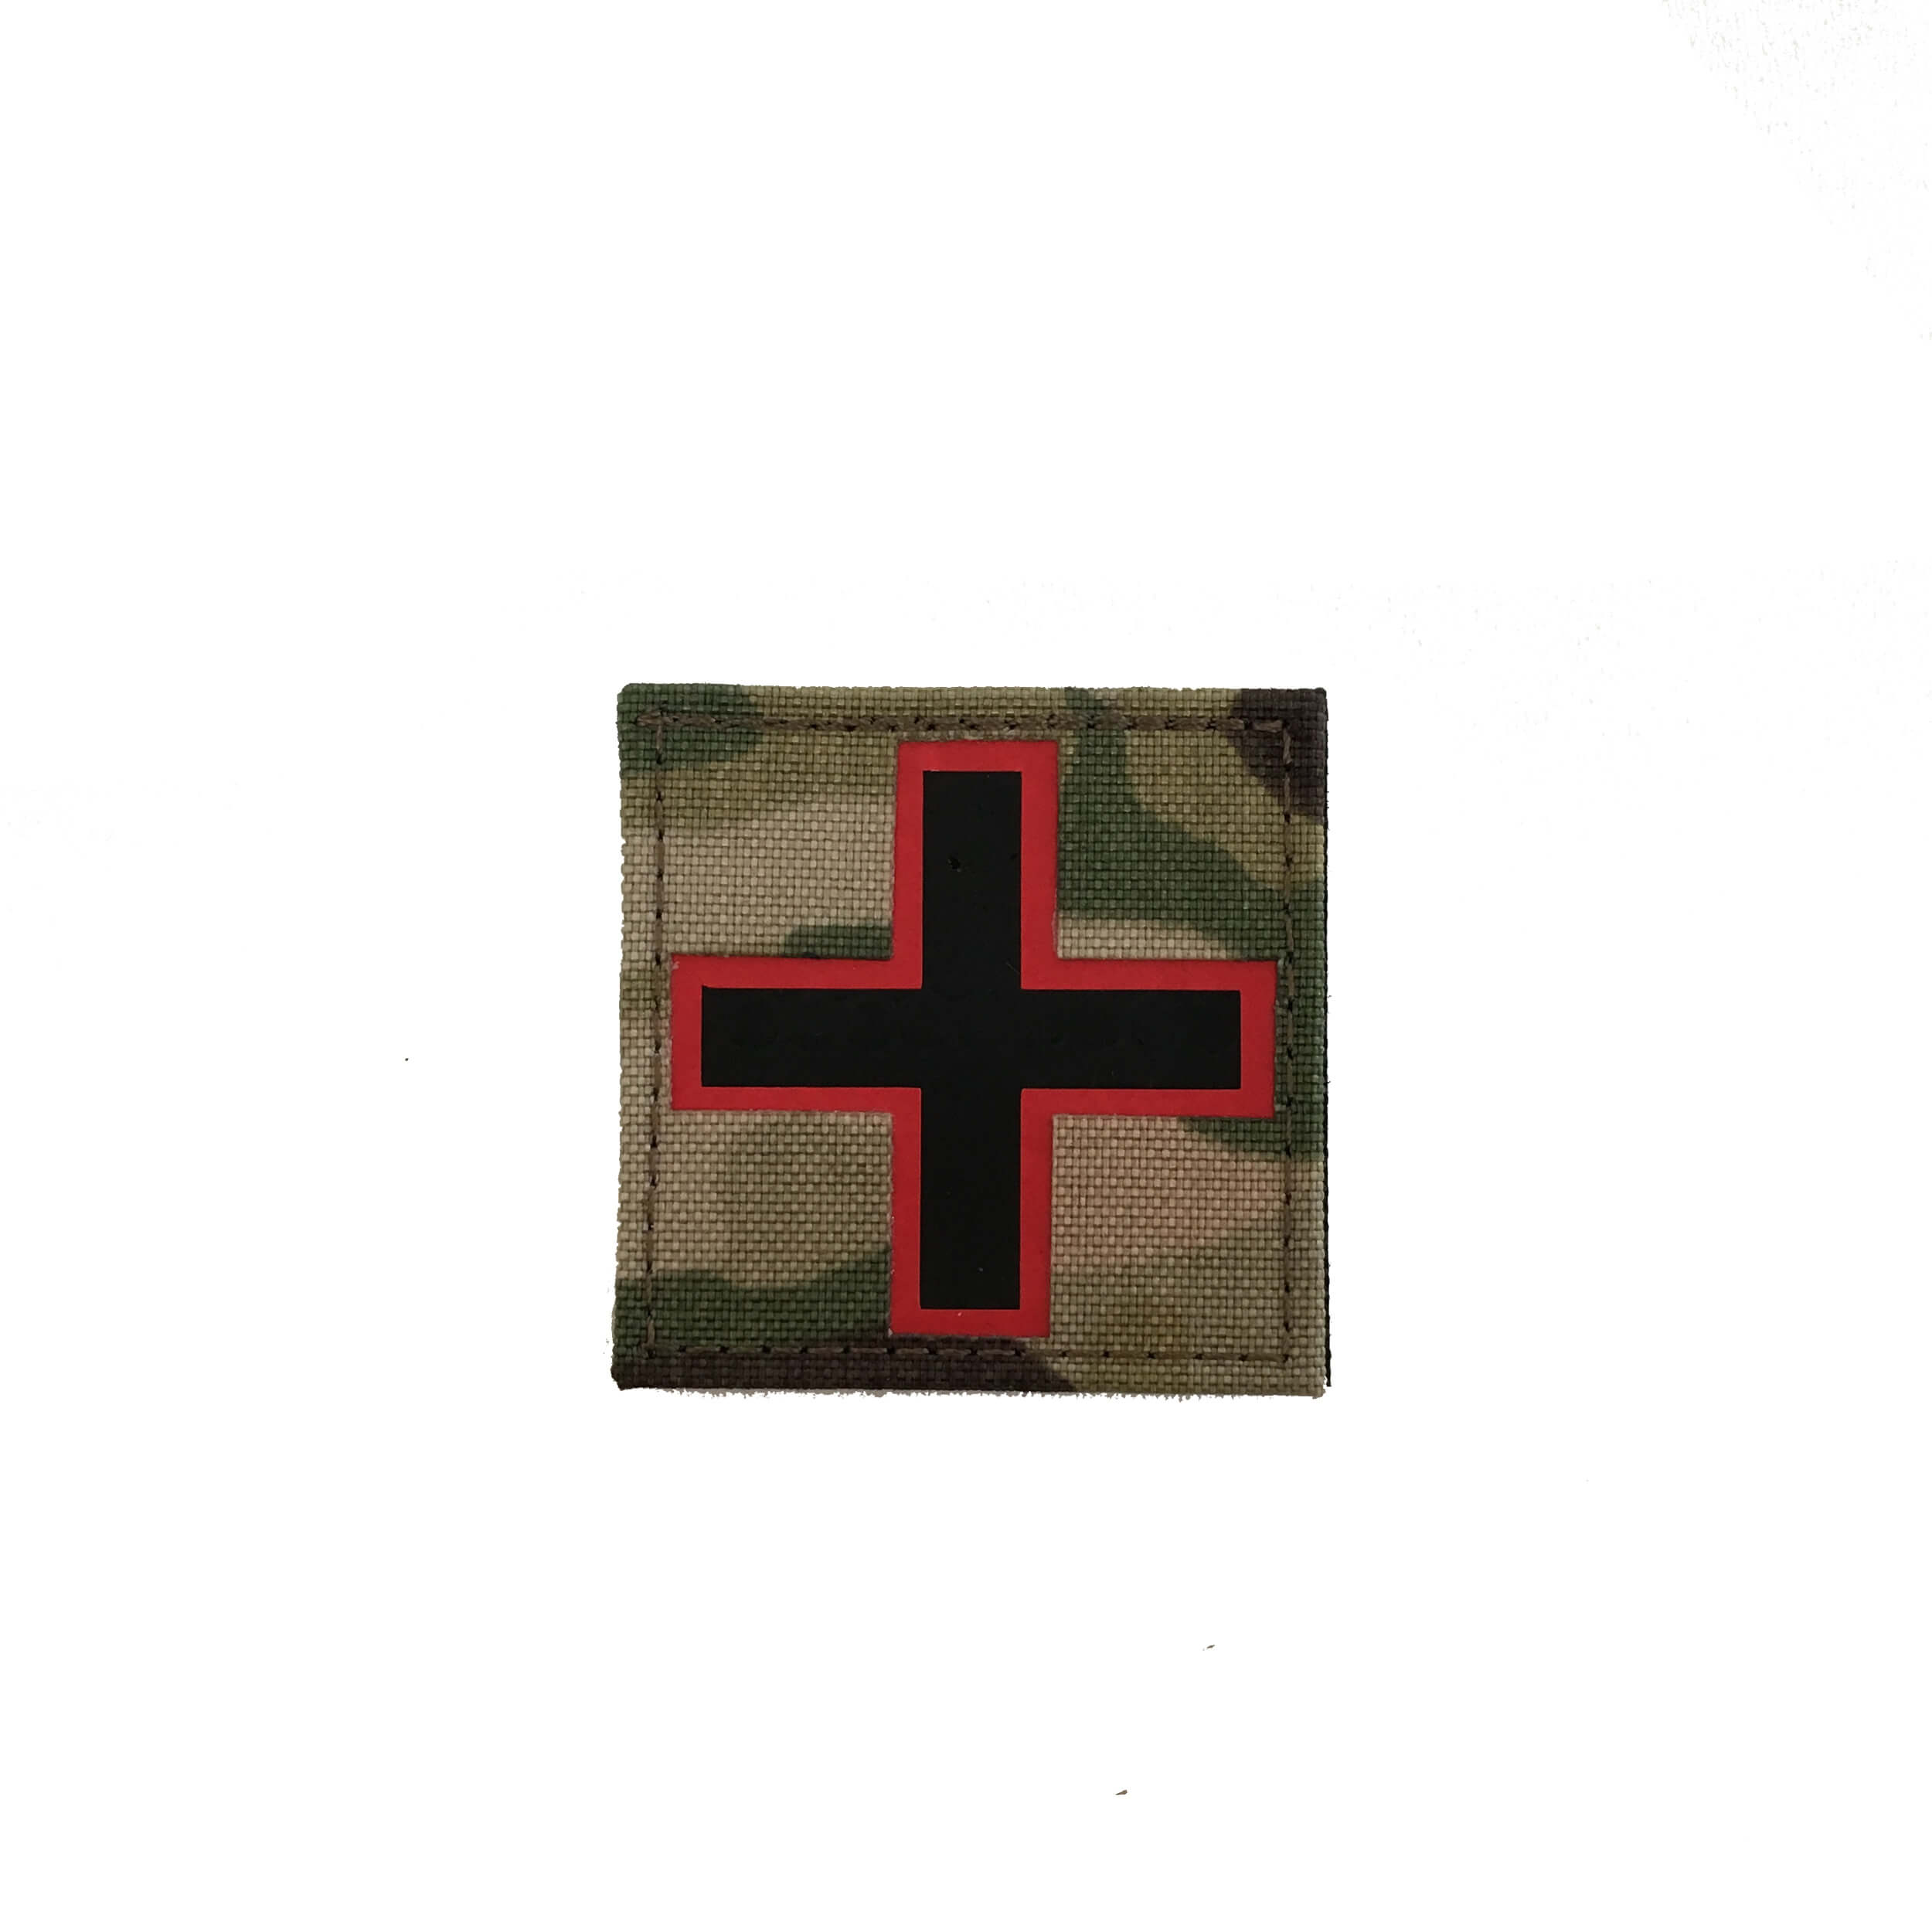 JTG RedCross Medic - IR / Infrarot Patch - Cordura Lasercut, multicam